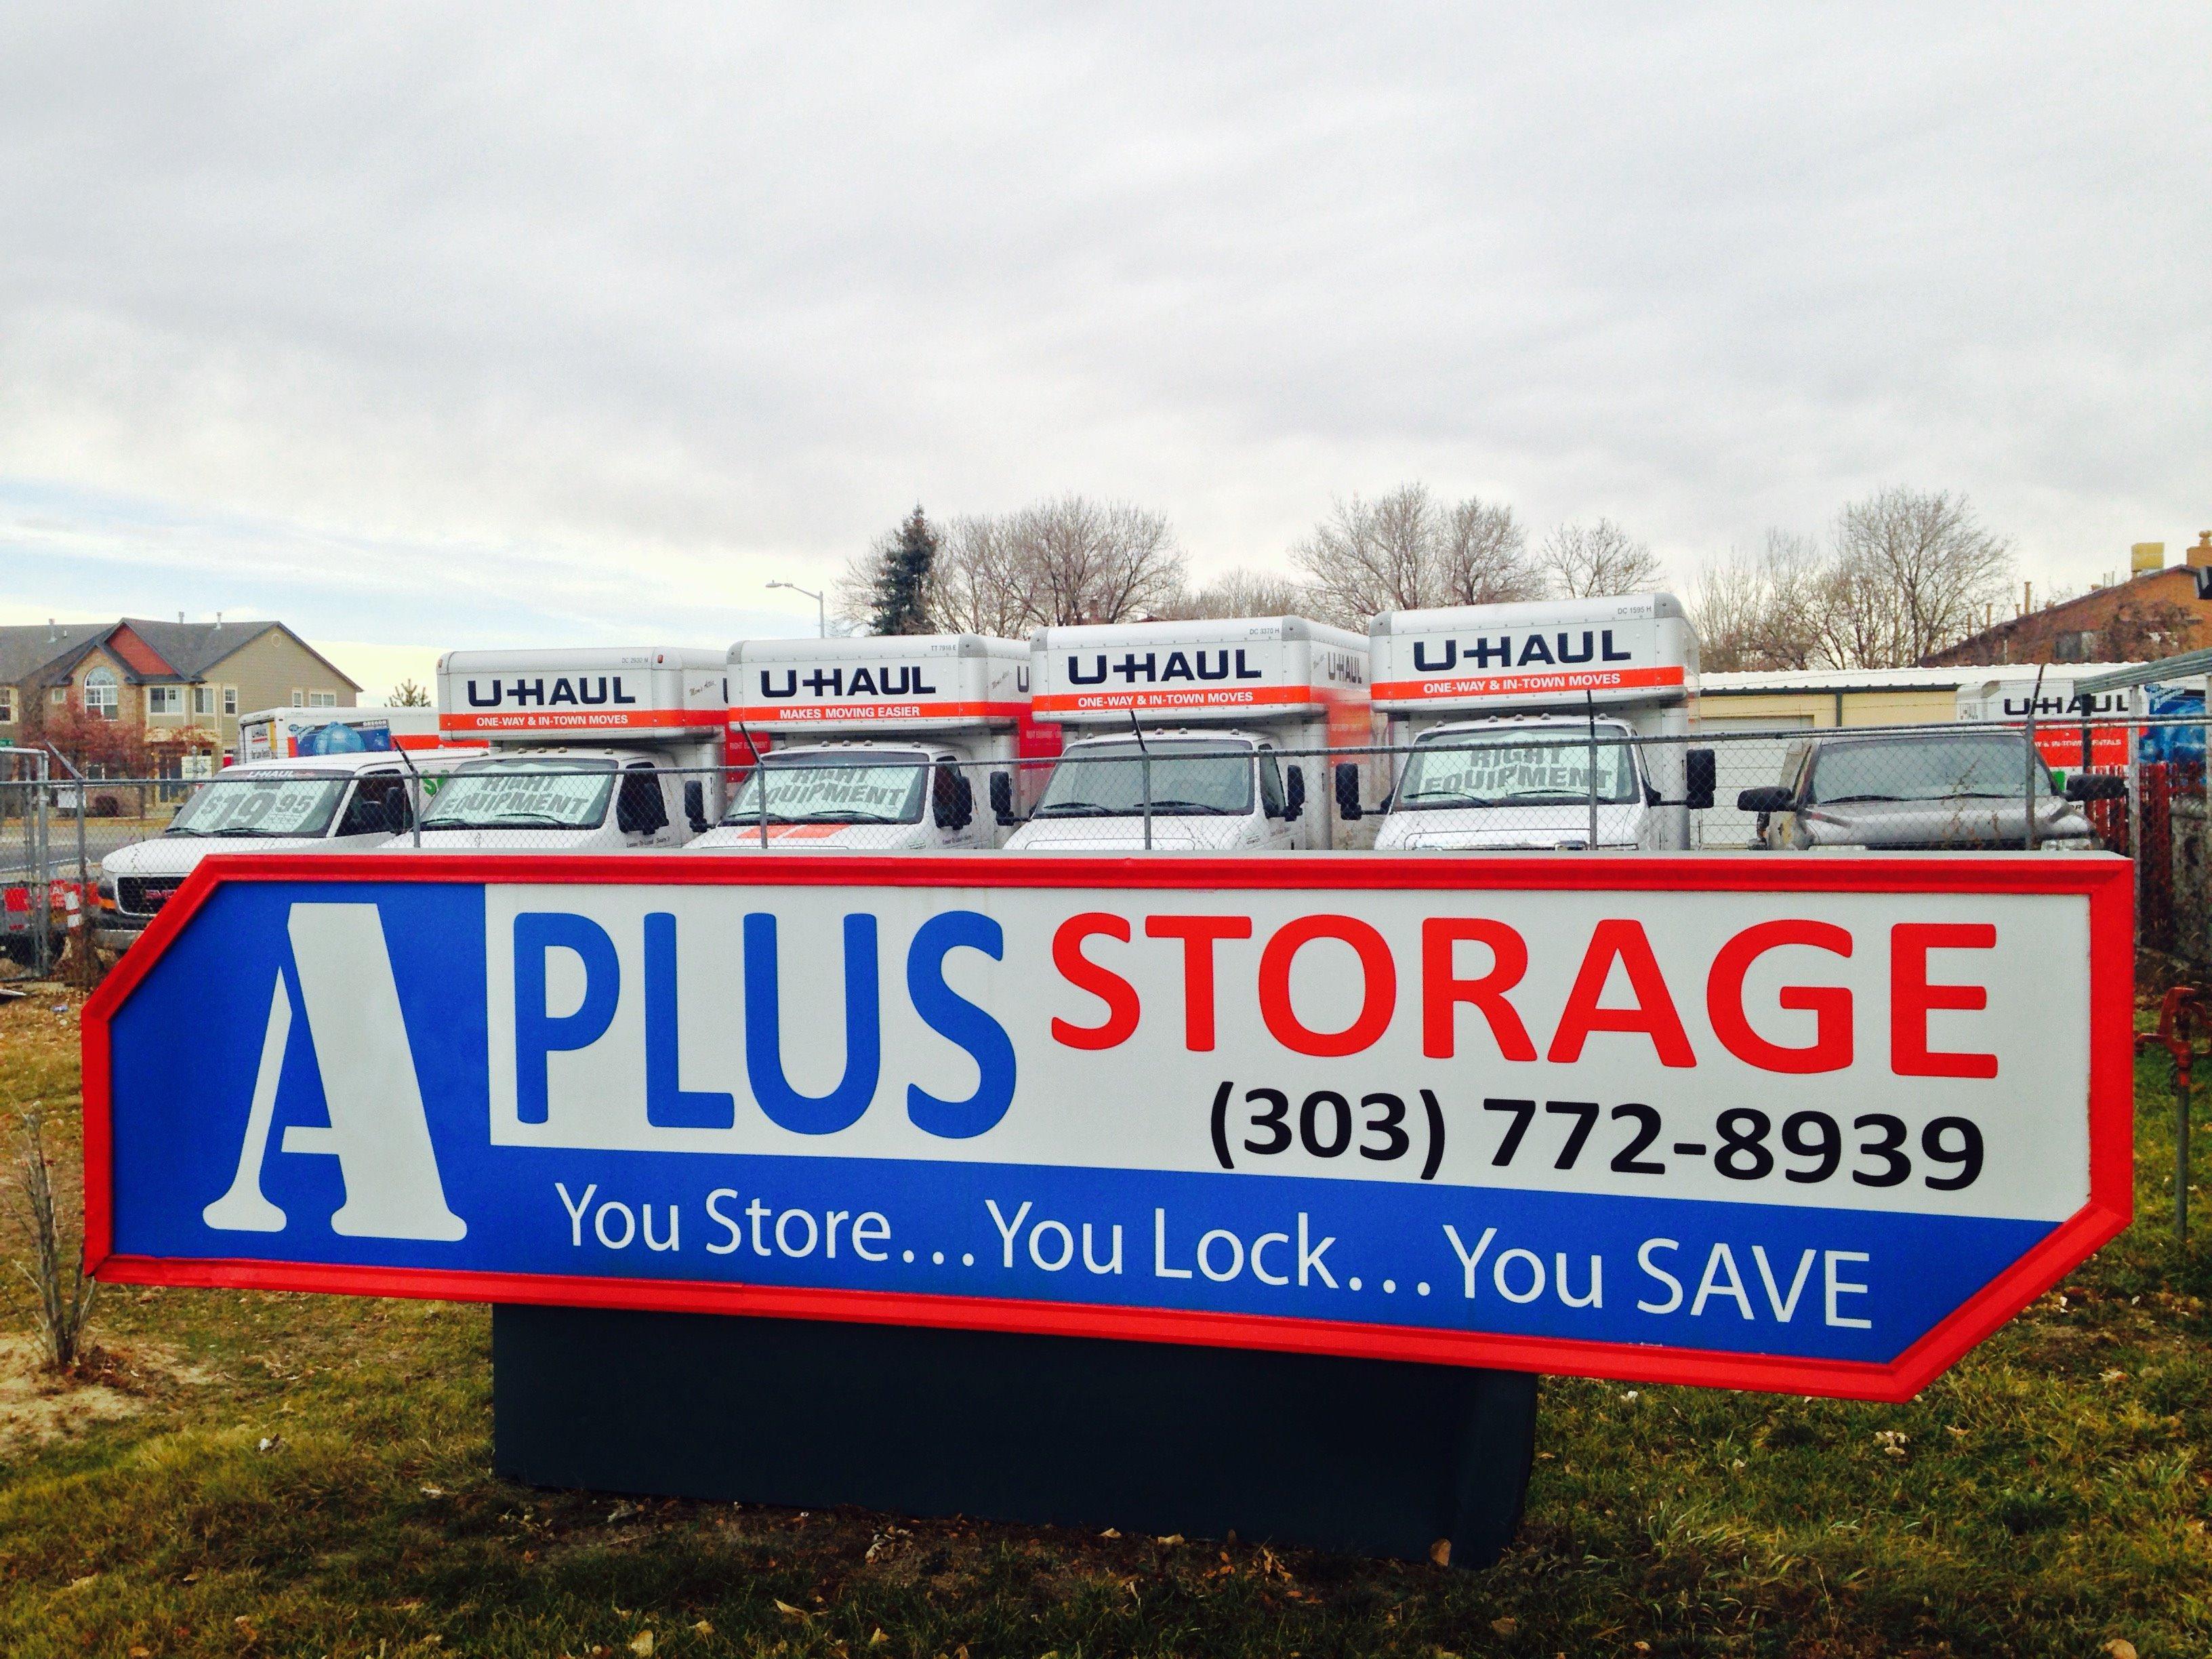 A-Plus Self Storage image 1